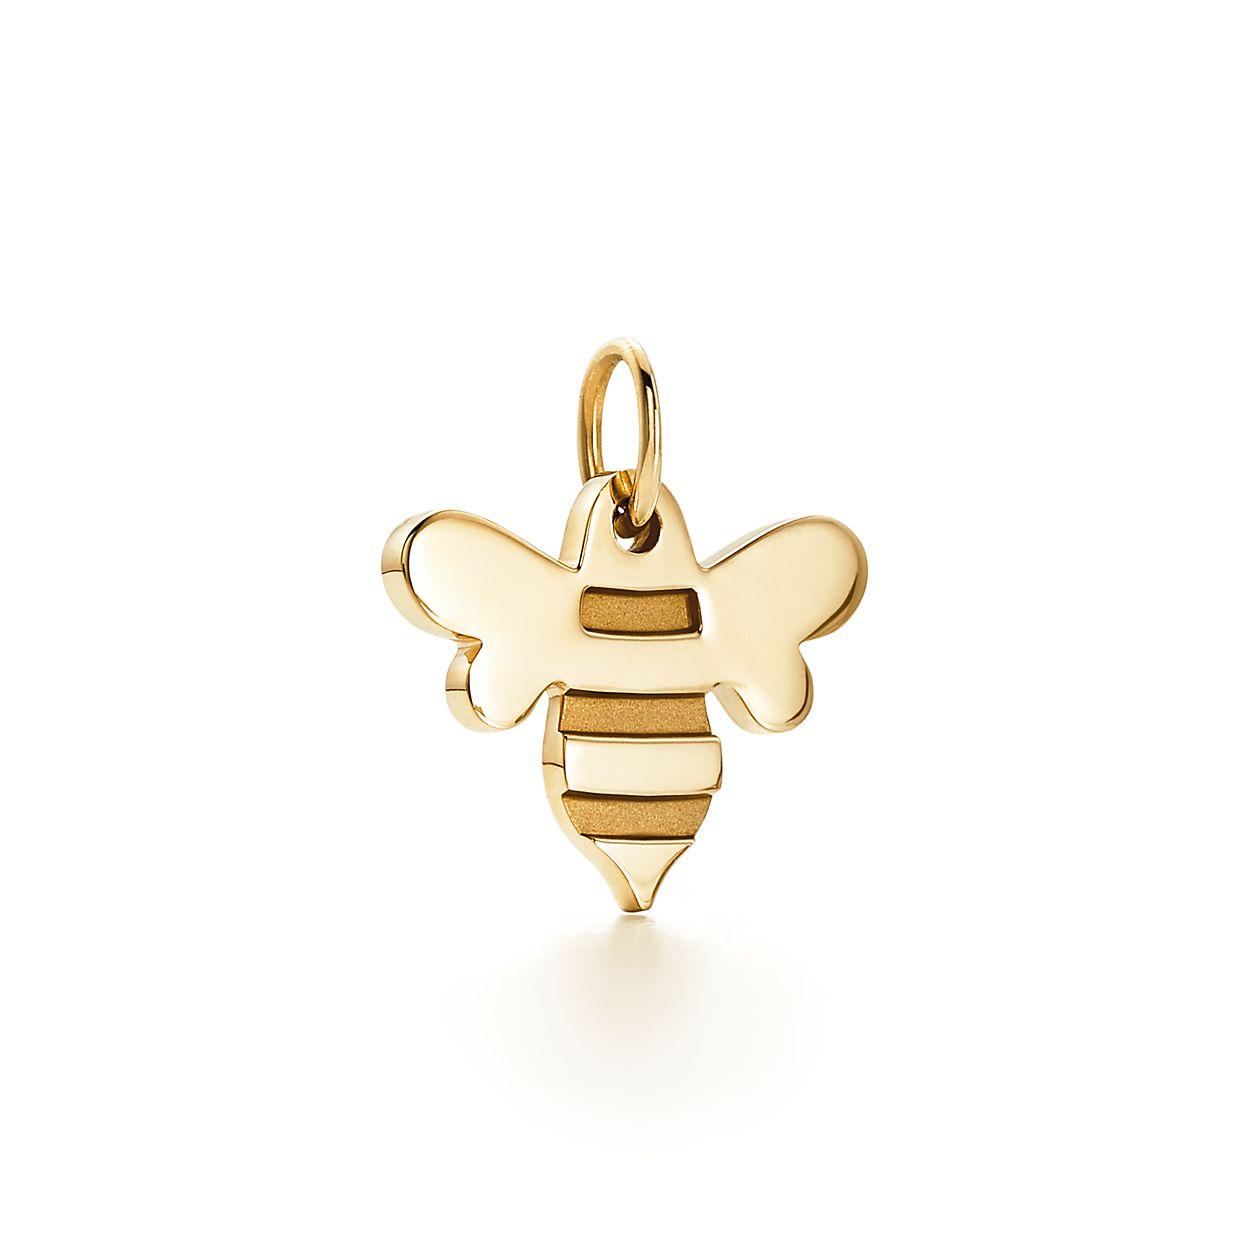 Tiffany Charms honey bee charm in 18k gold Tiffany & Co. 2bwg13j